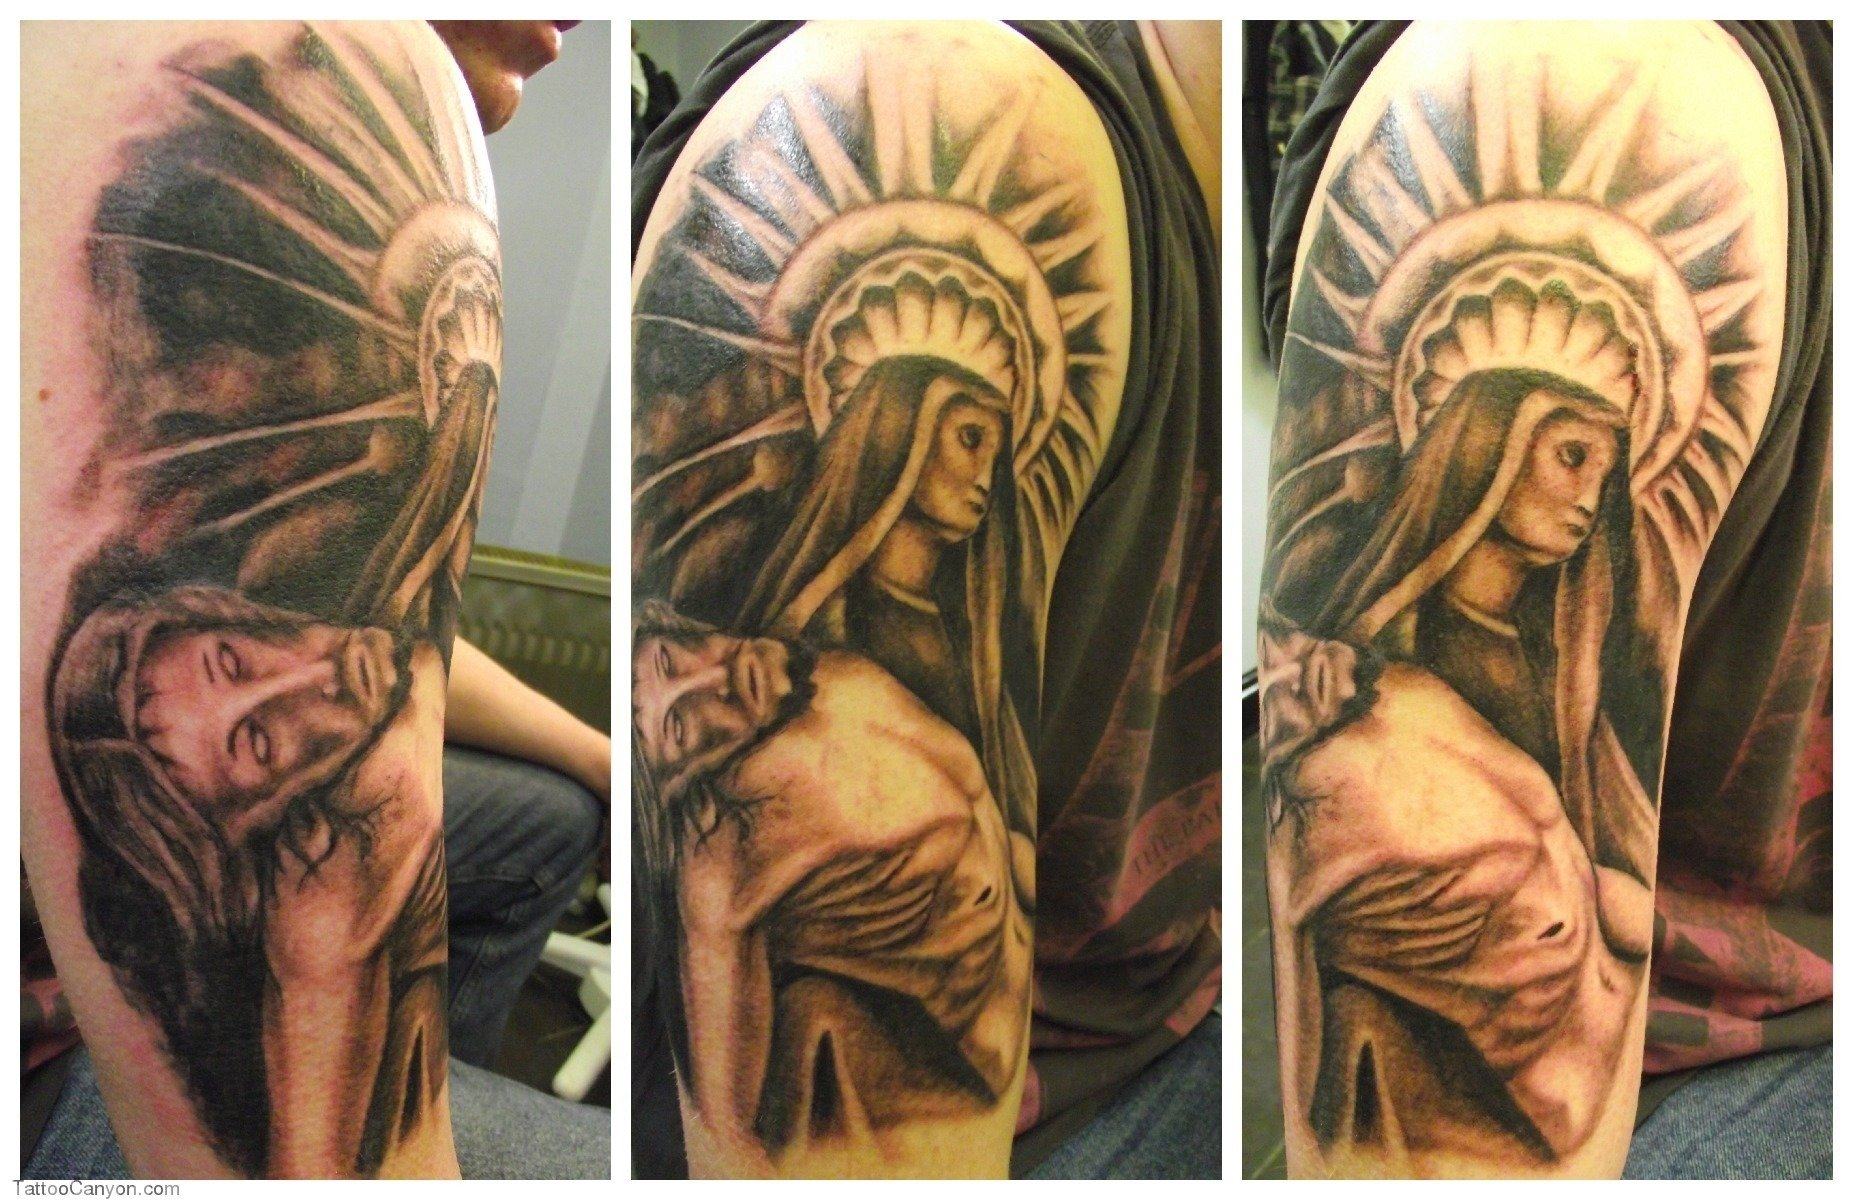 10 Famous Religious Tattoo Ideas For Men religious full sleeve tattoo designs for men tattoo love 2021